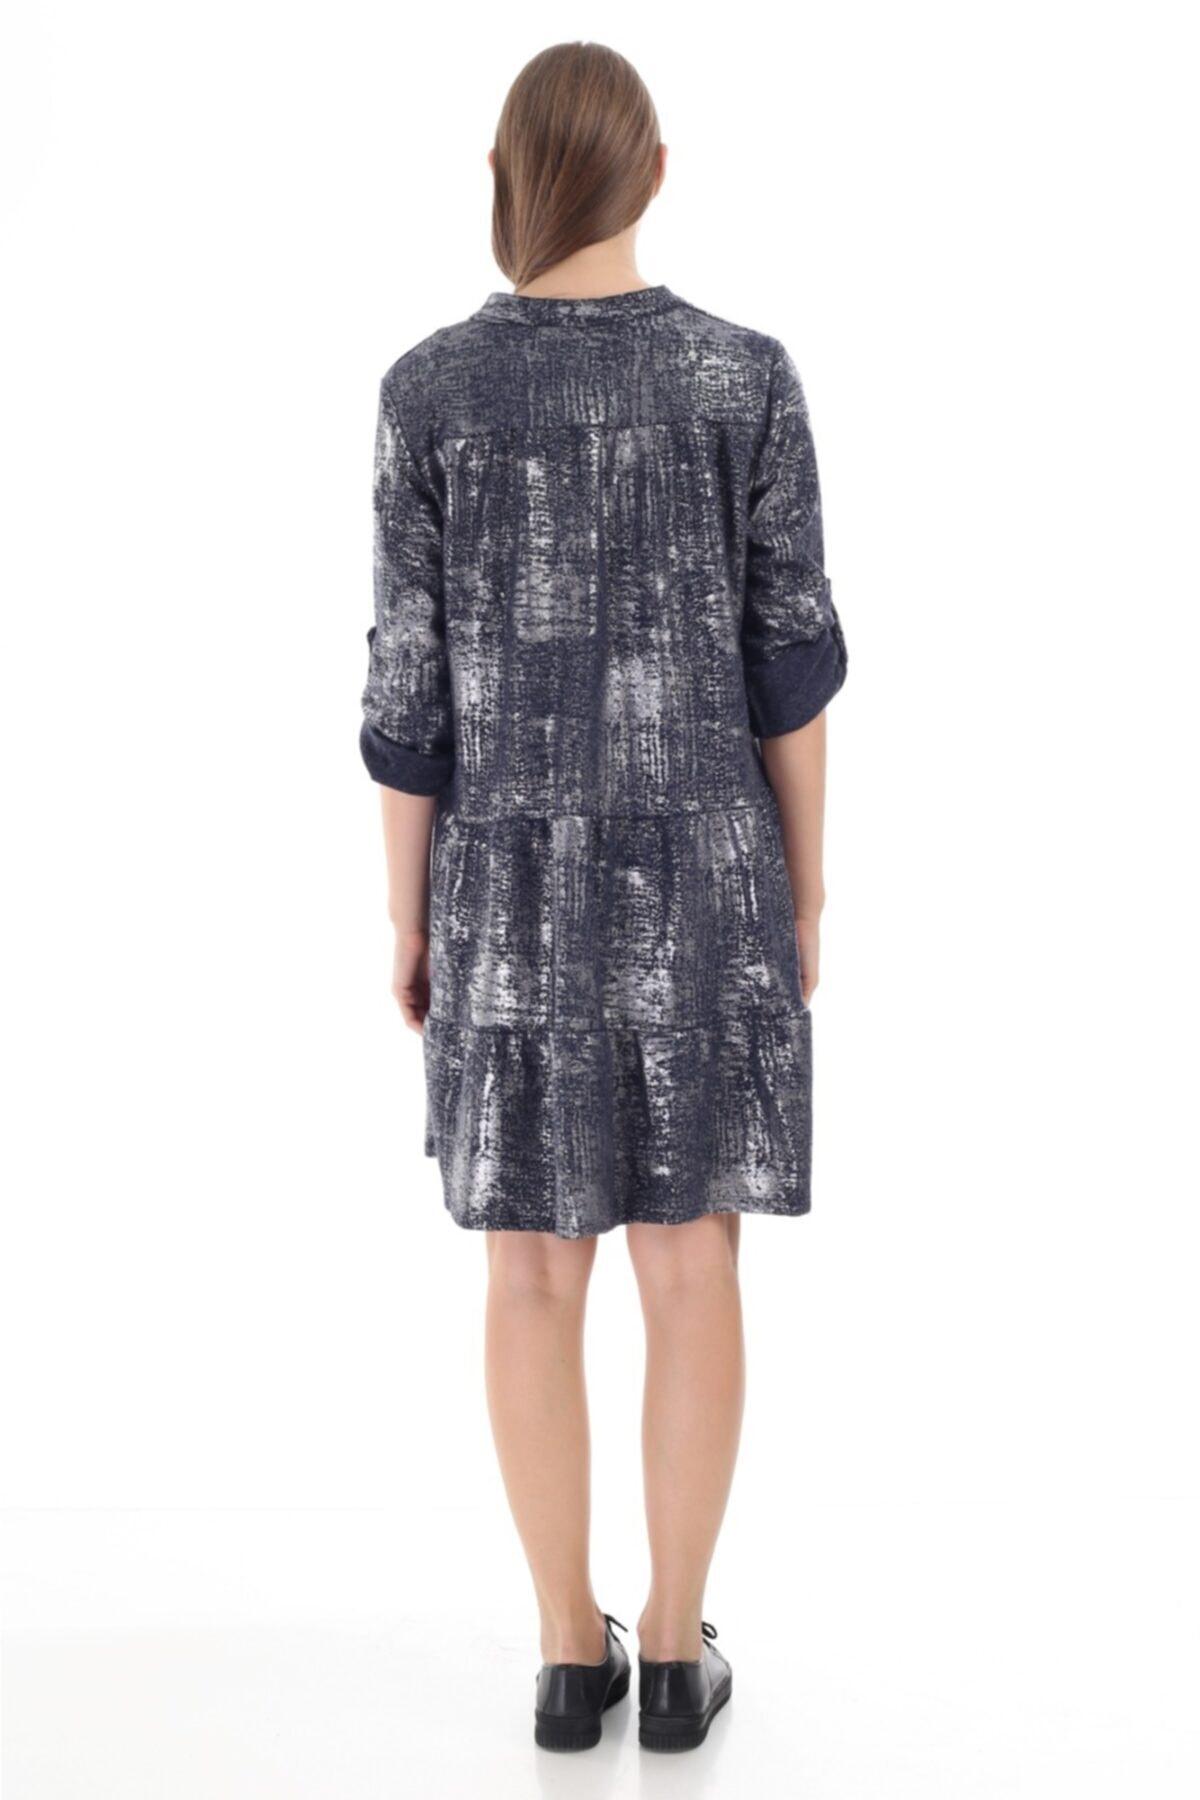 FD Fast Kadın Ithal Lacivert Sim Detaylı Italyan Model Elbise 16012 2